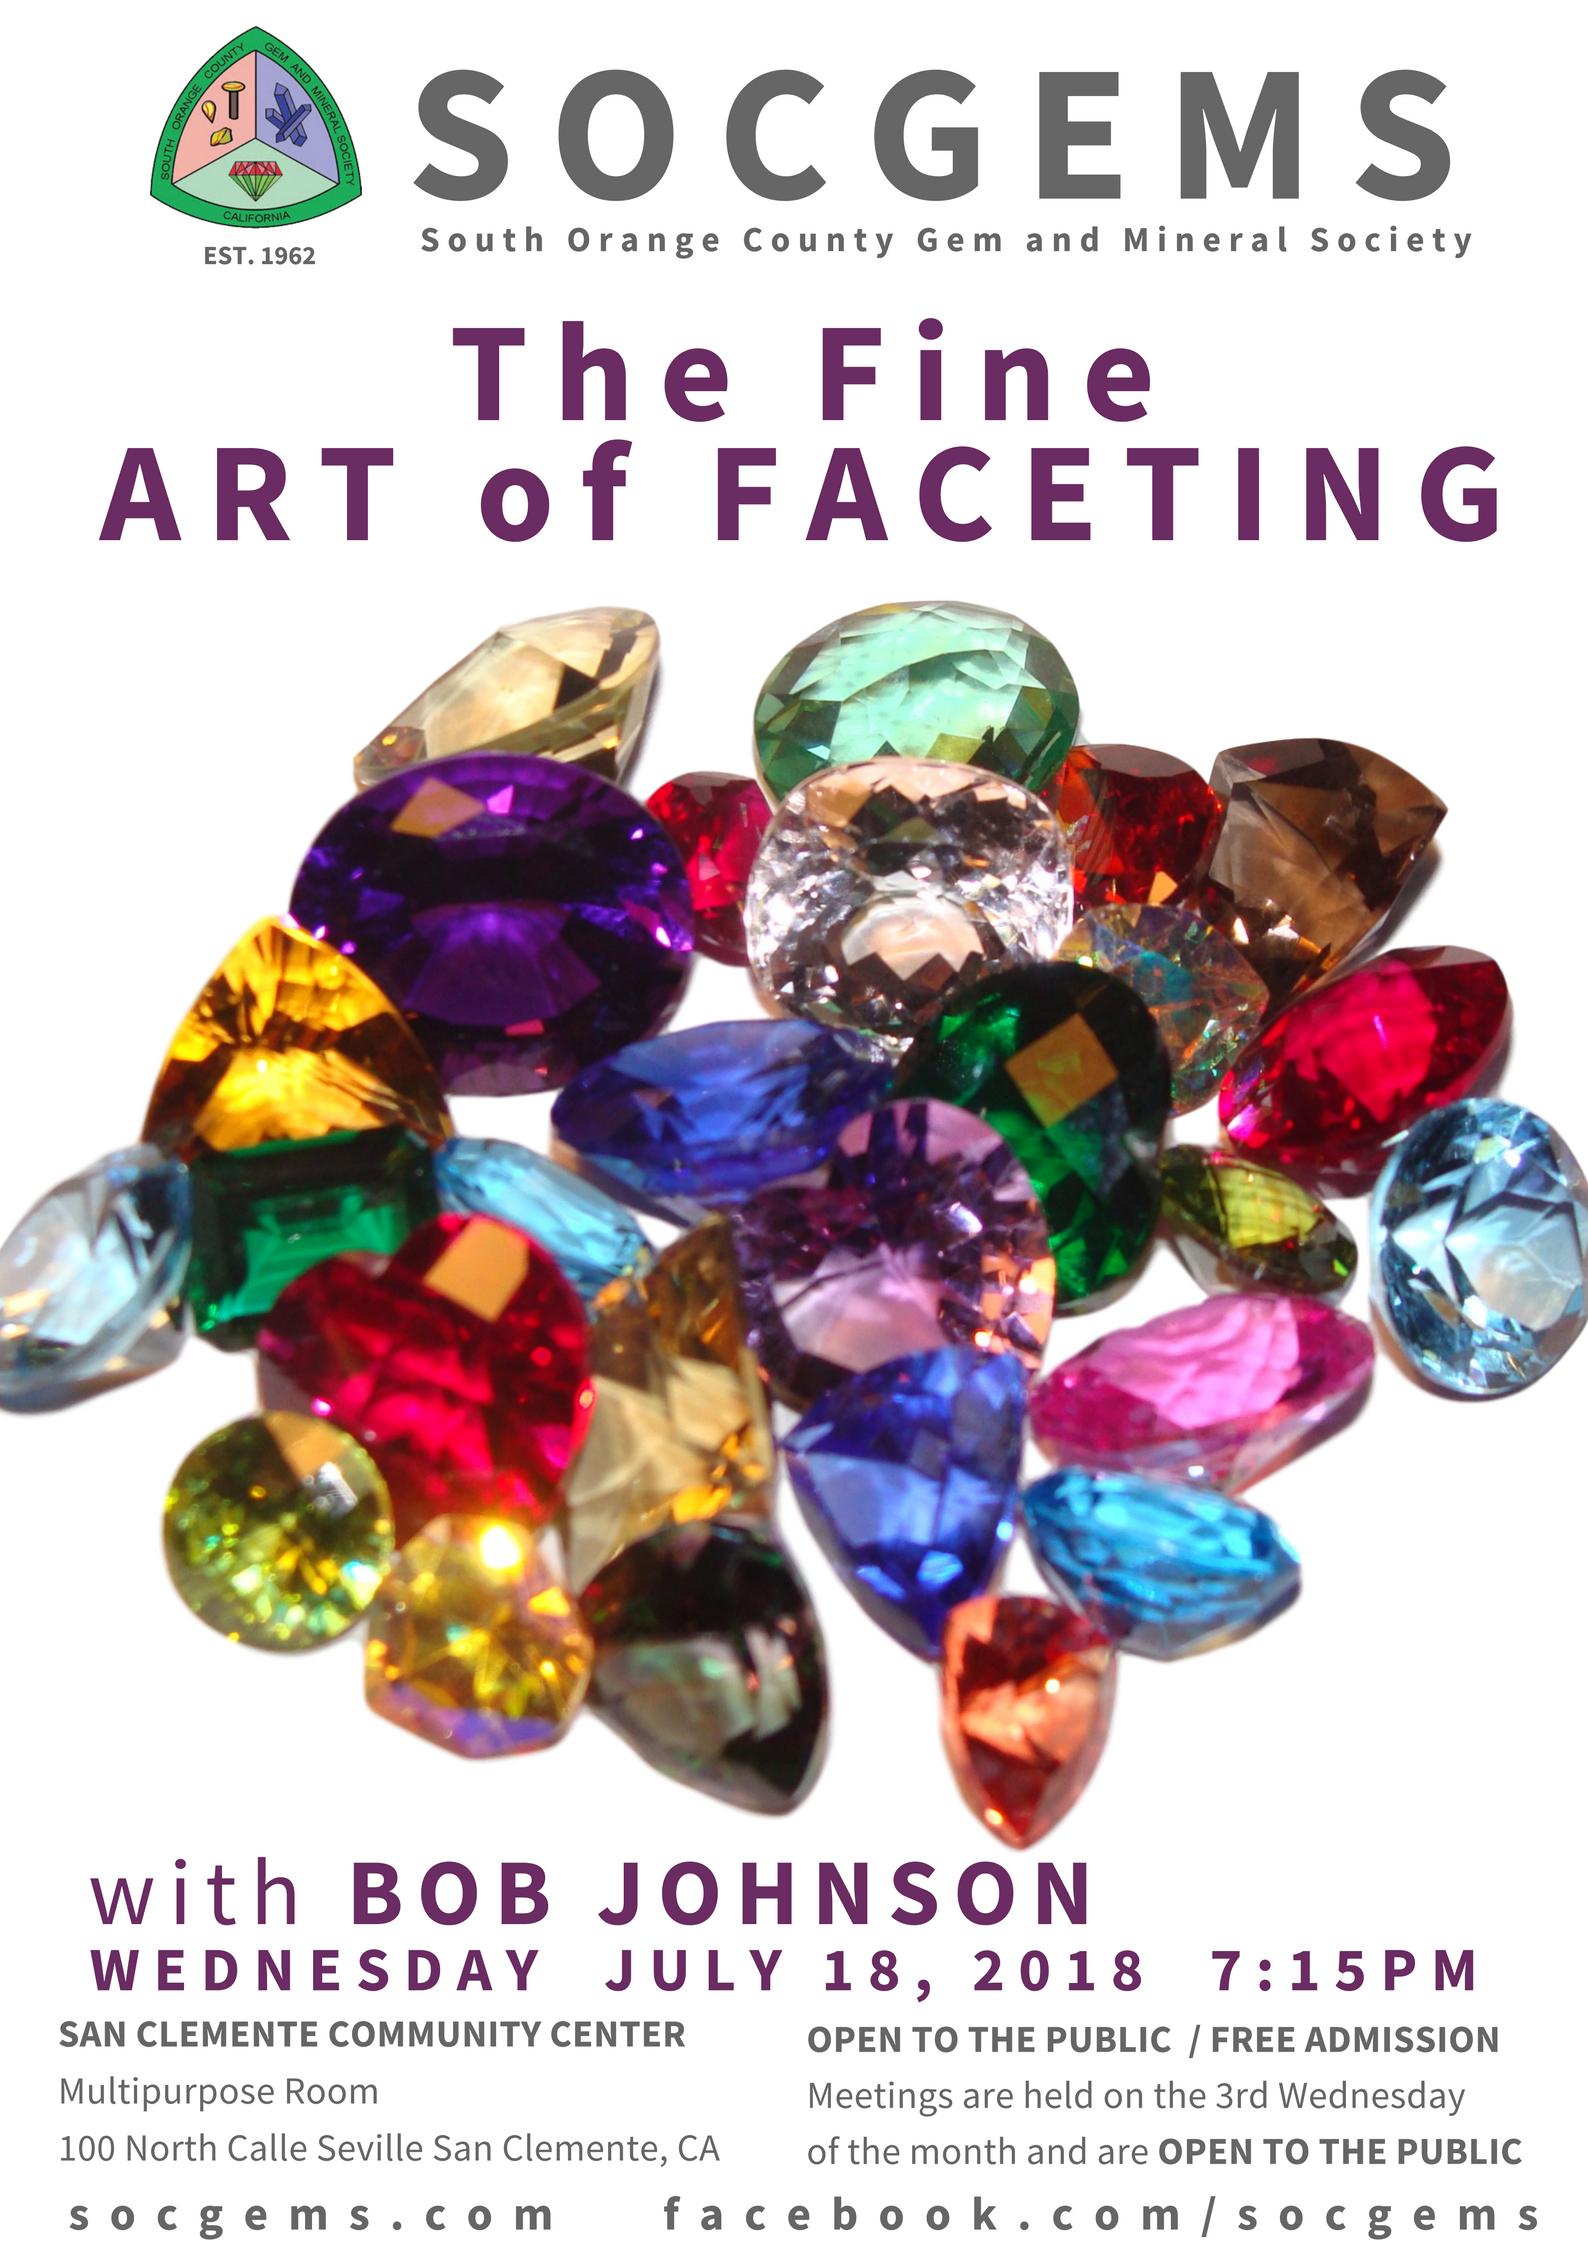 bob johnson july 2018 socgems faceting